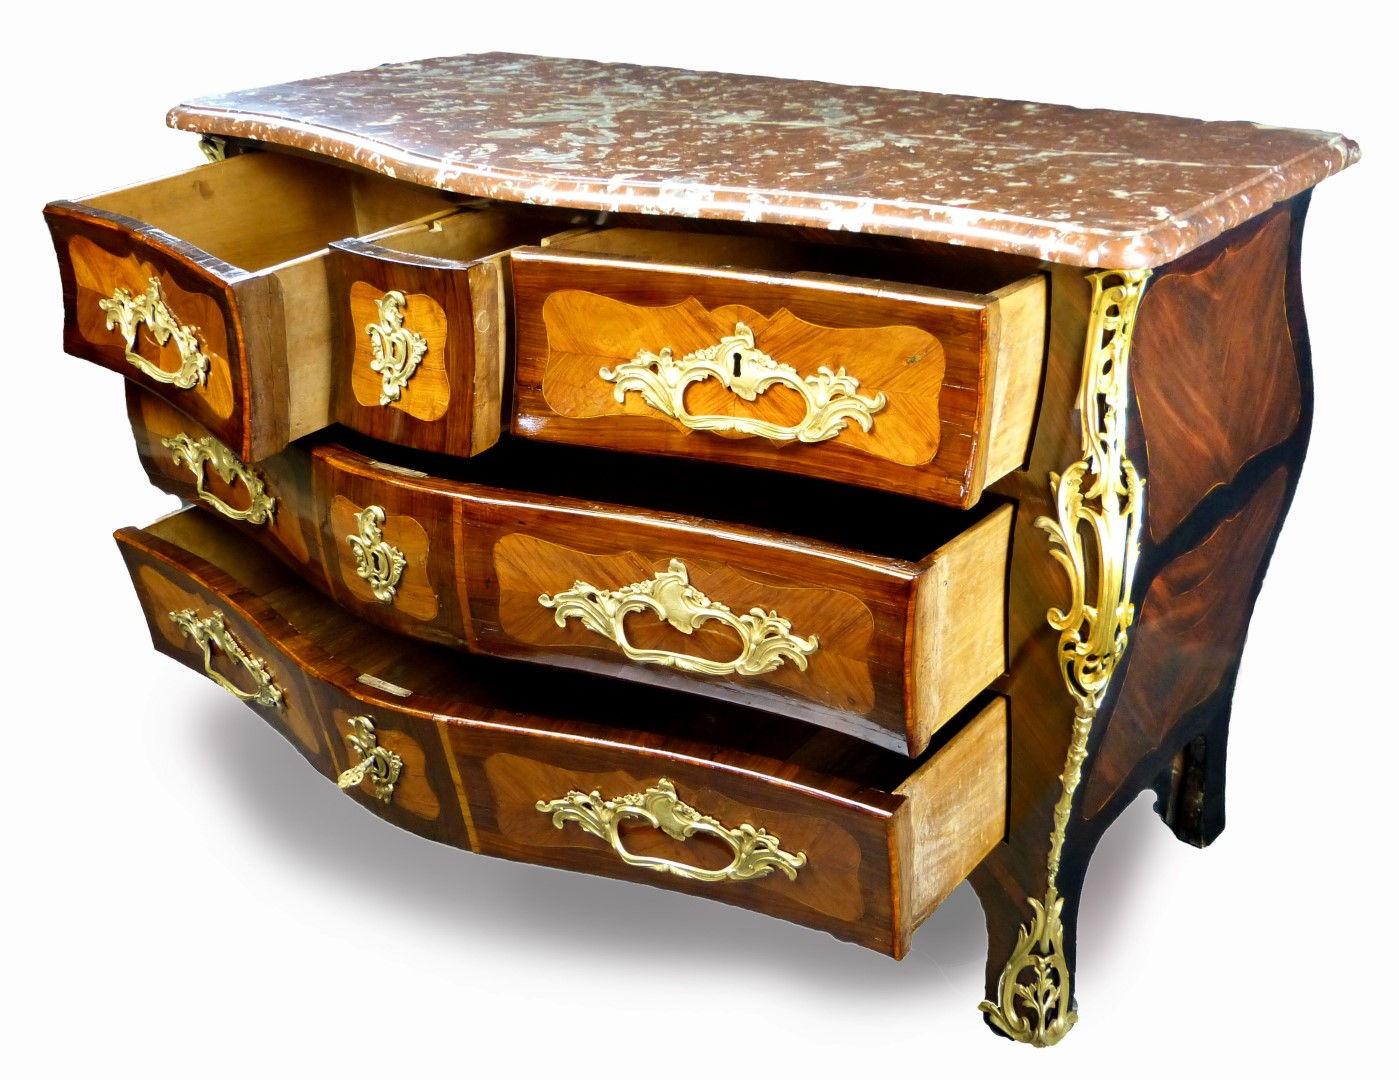 Muebles Antiguos Armarios Antiguos Mesas Antiguas C Modas  # Muebles Lado Cee